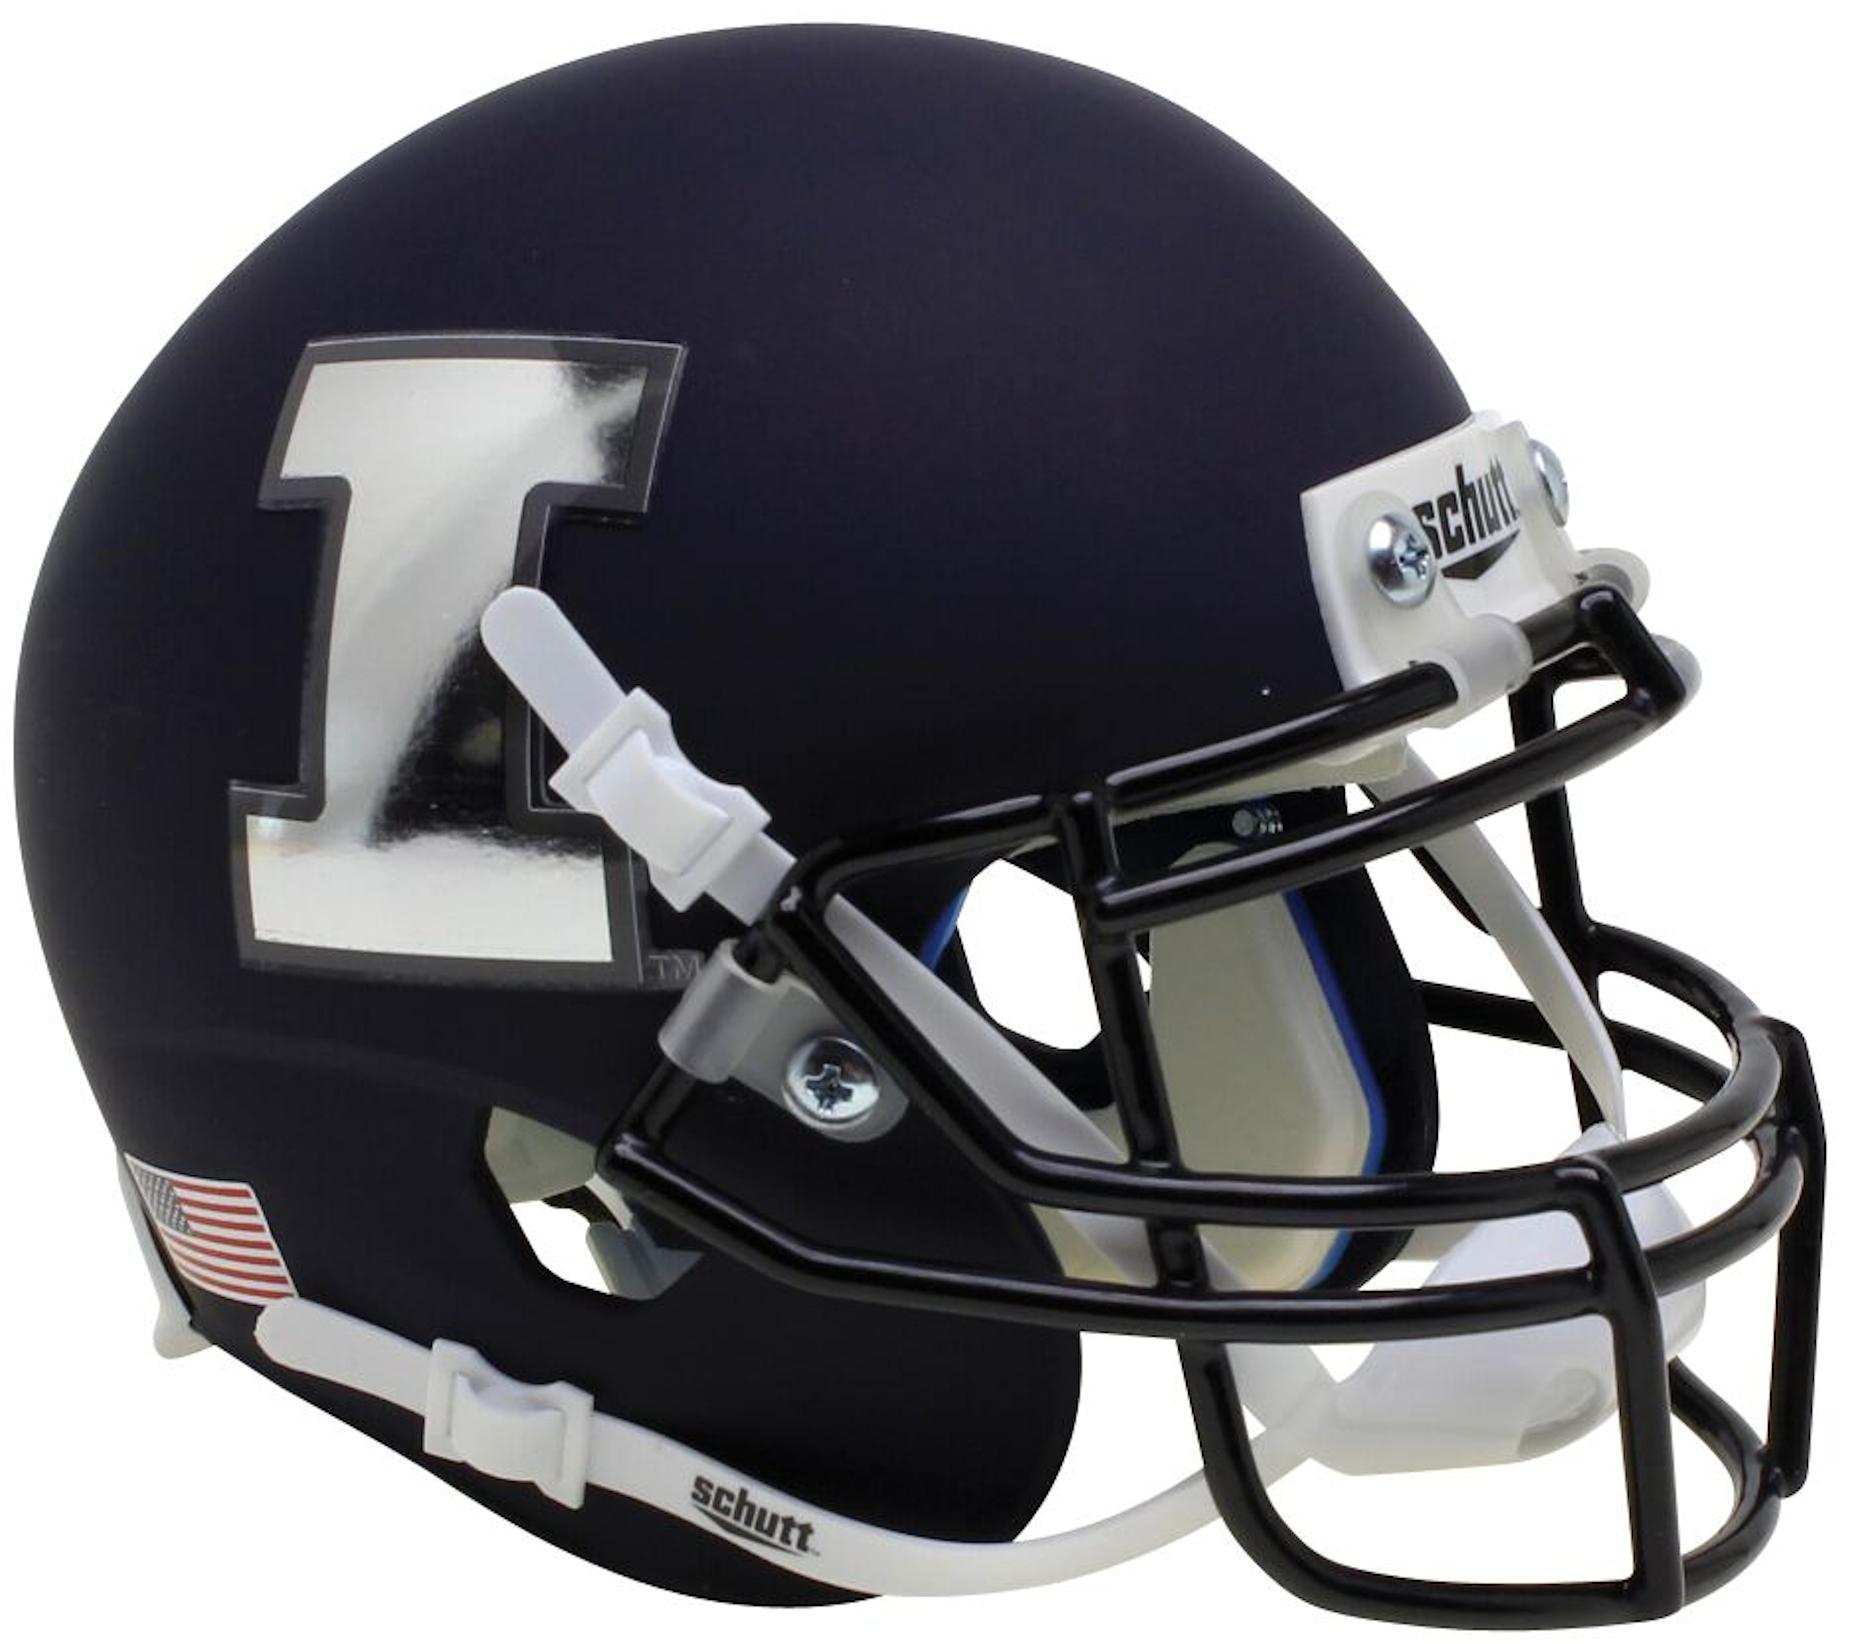 Illinois Fighting Illini Authentic College XP Football Helmet Schutt <B>Matte Black</B>